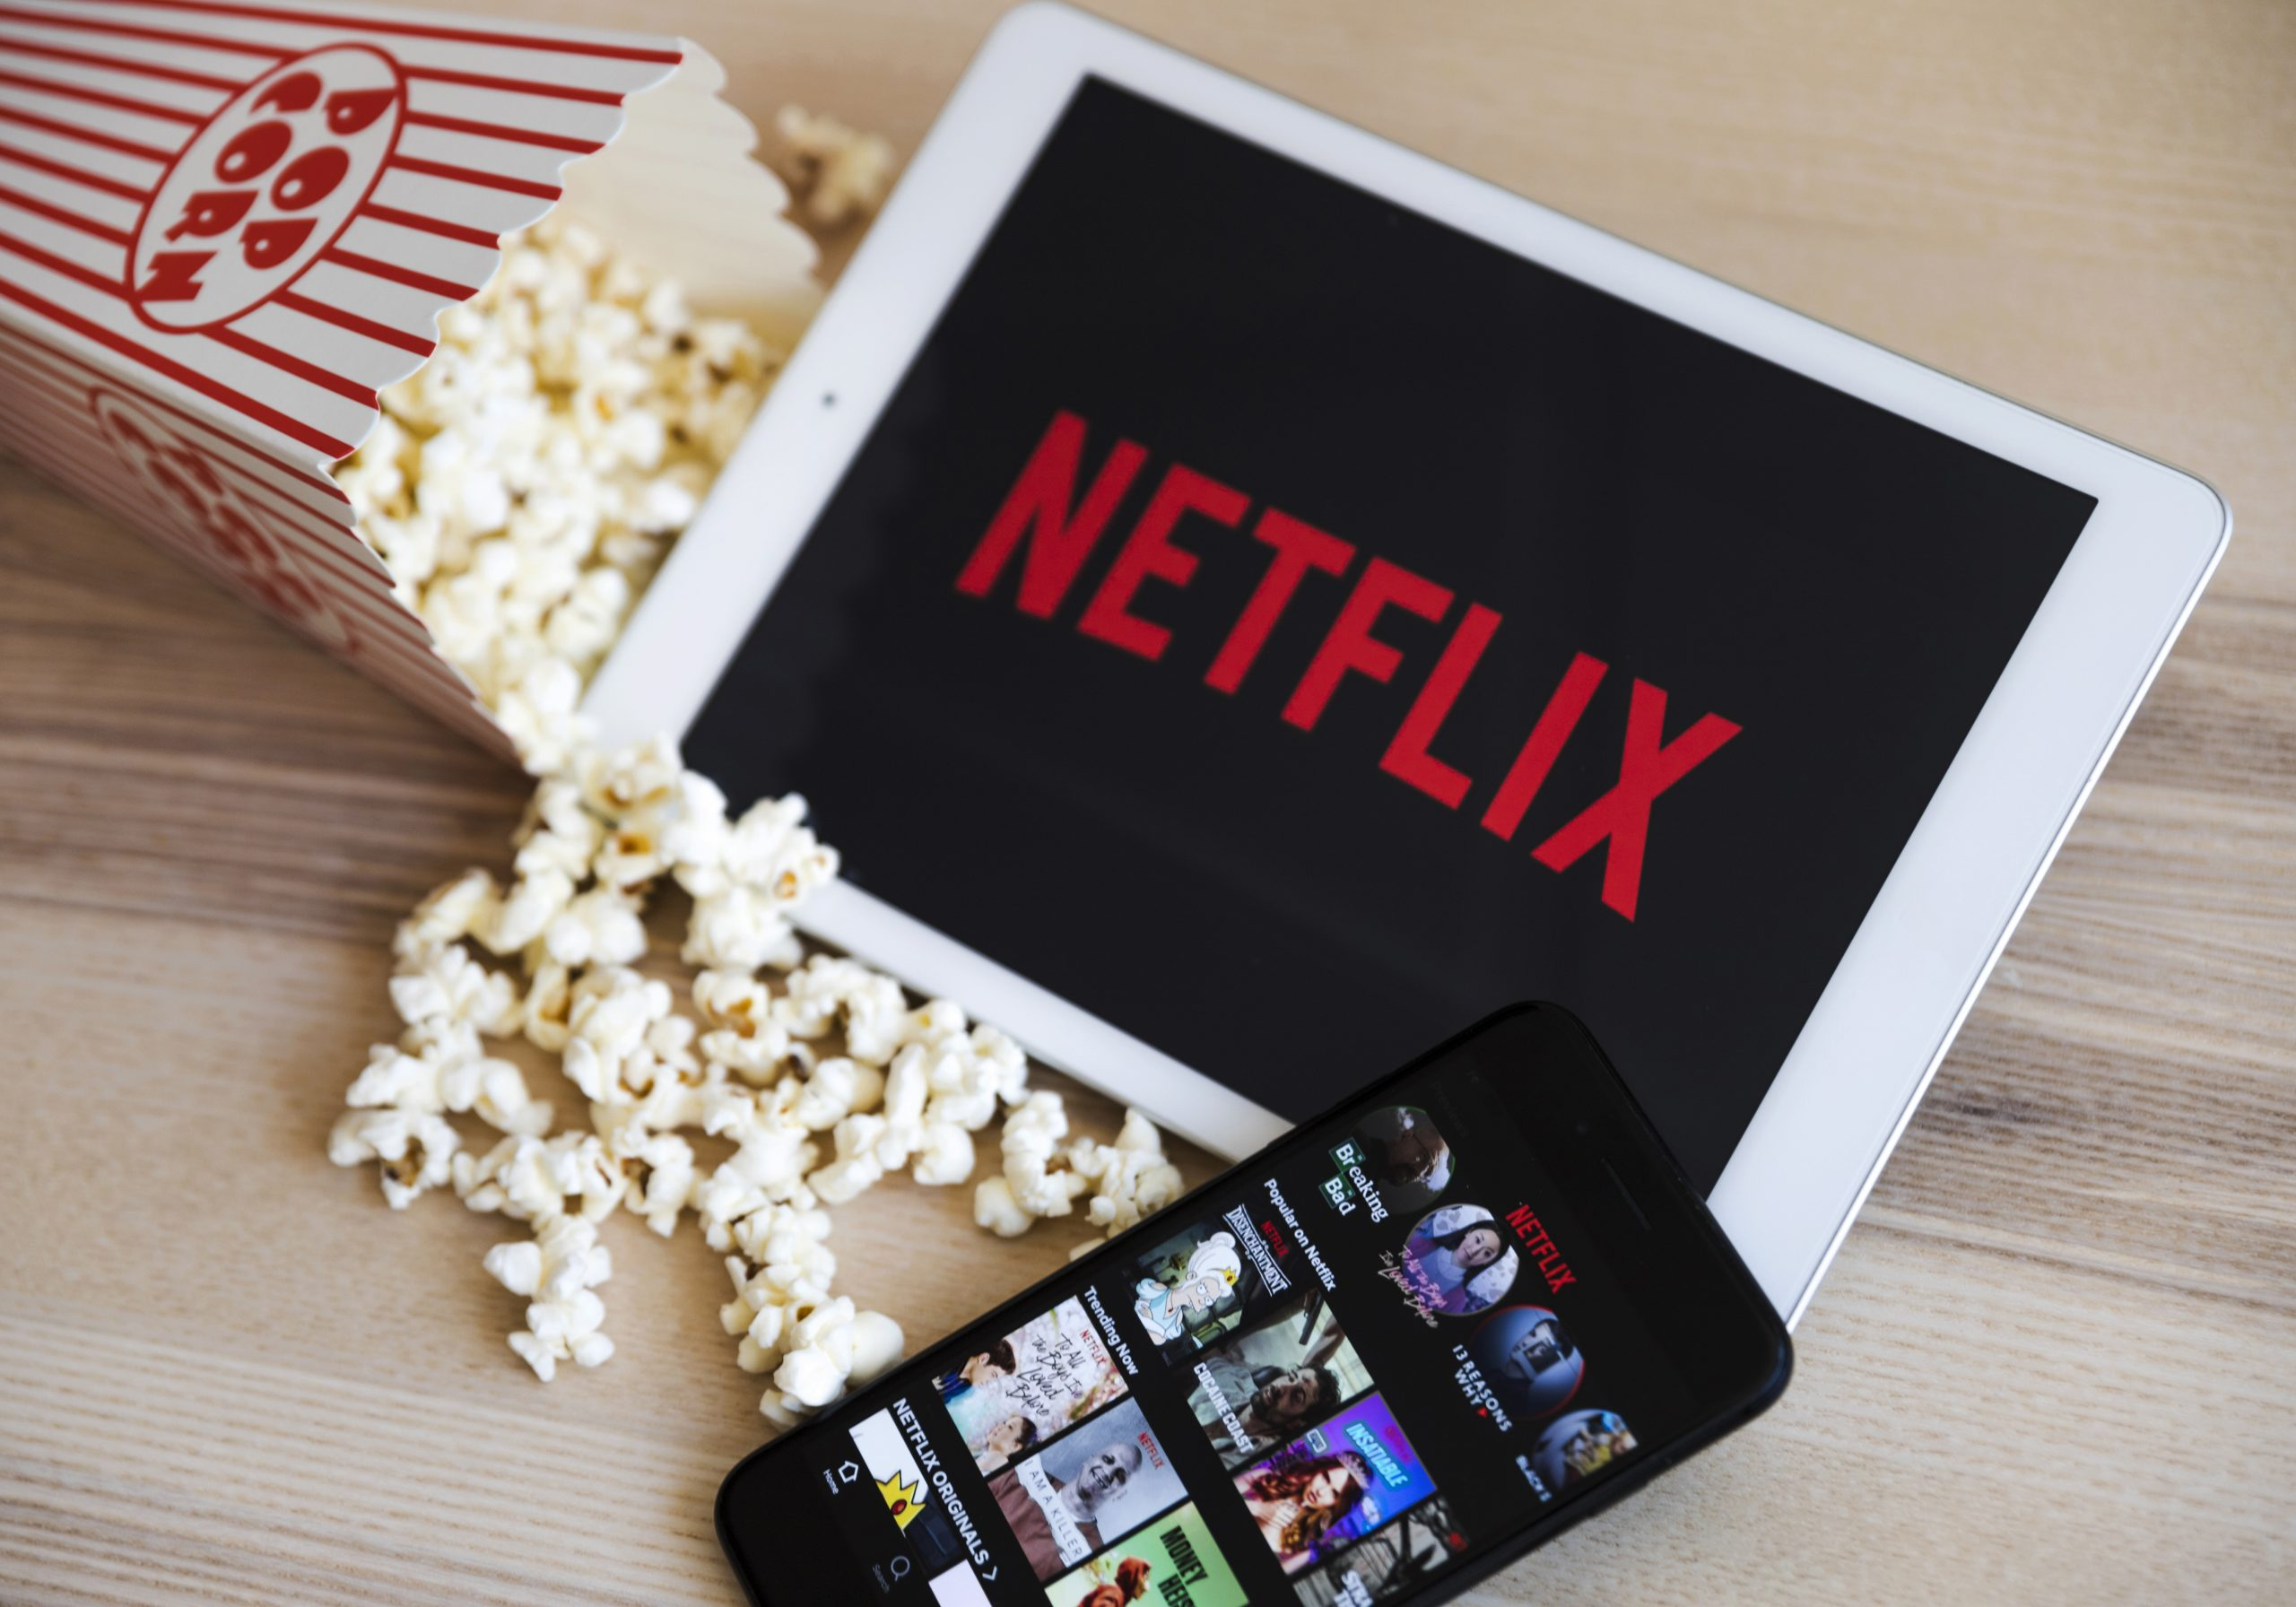 Creative Economy Working Group & Netflix Meeting Agenda